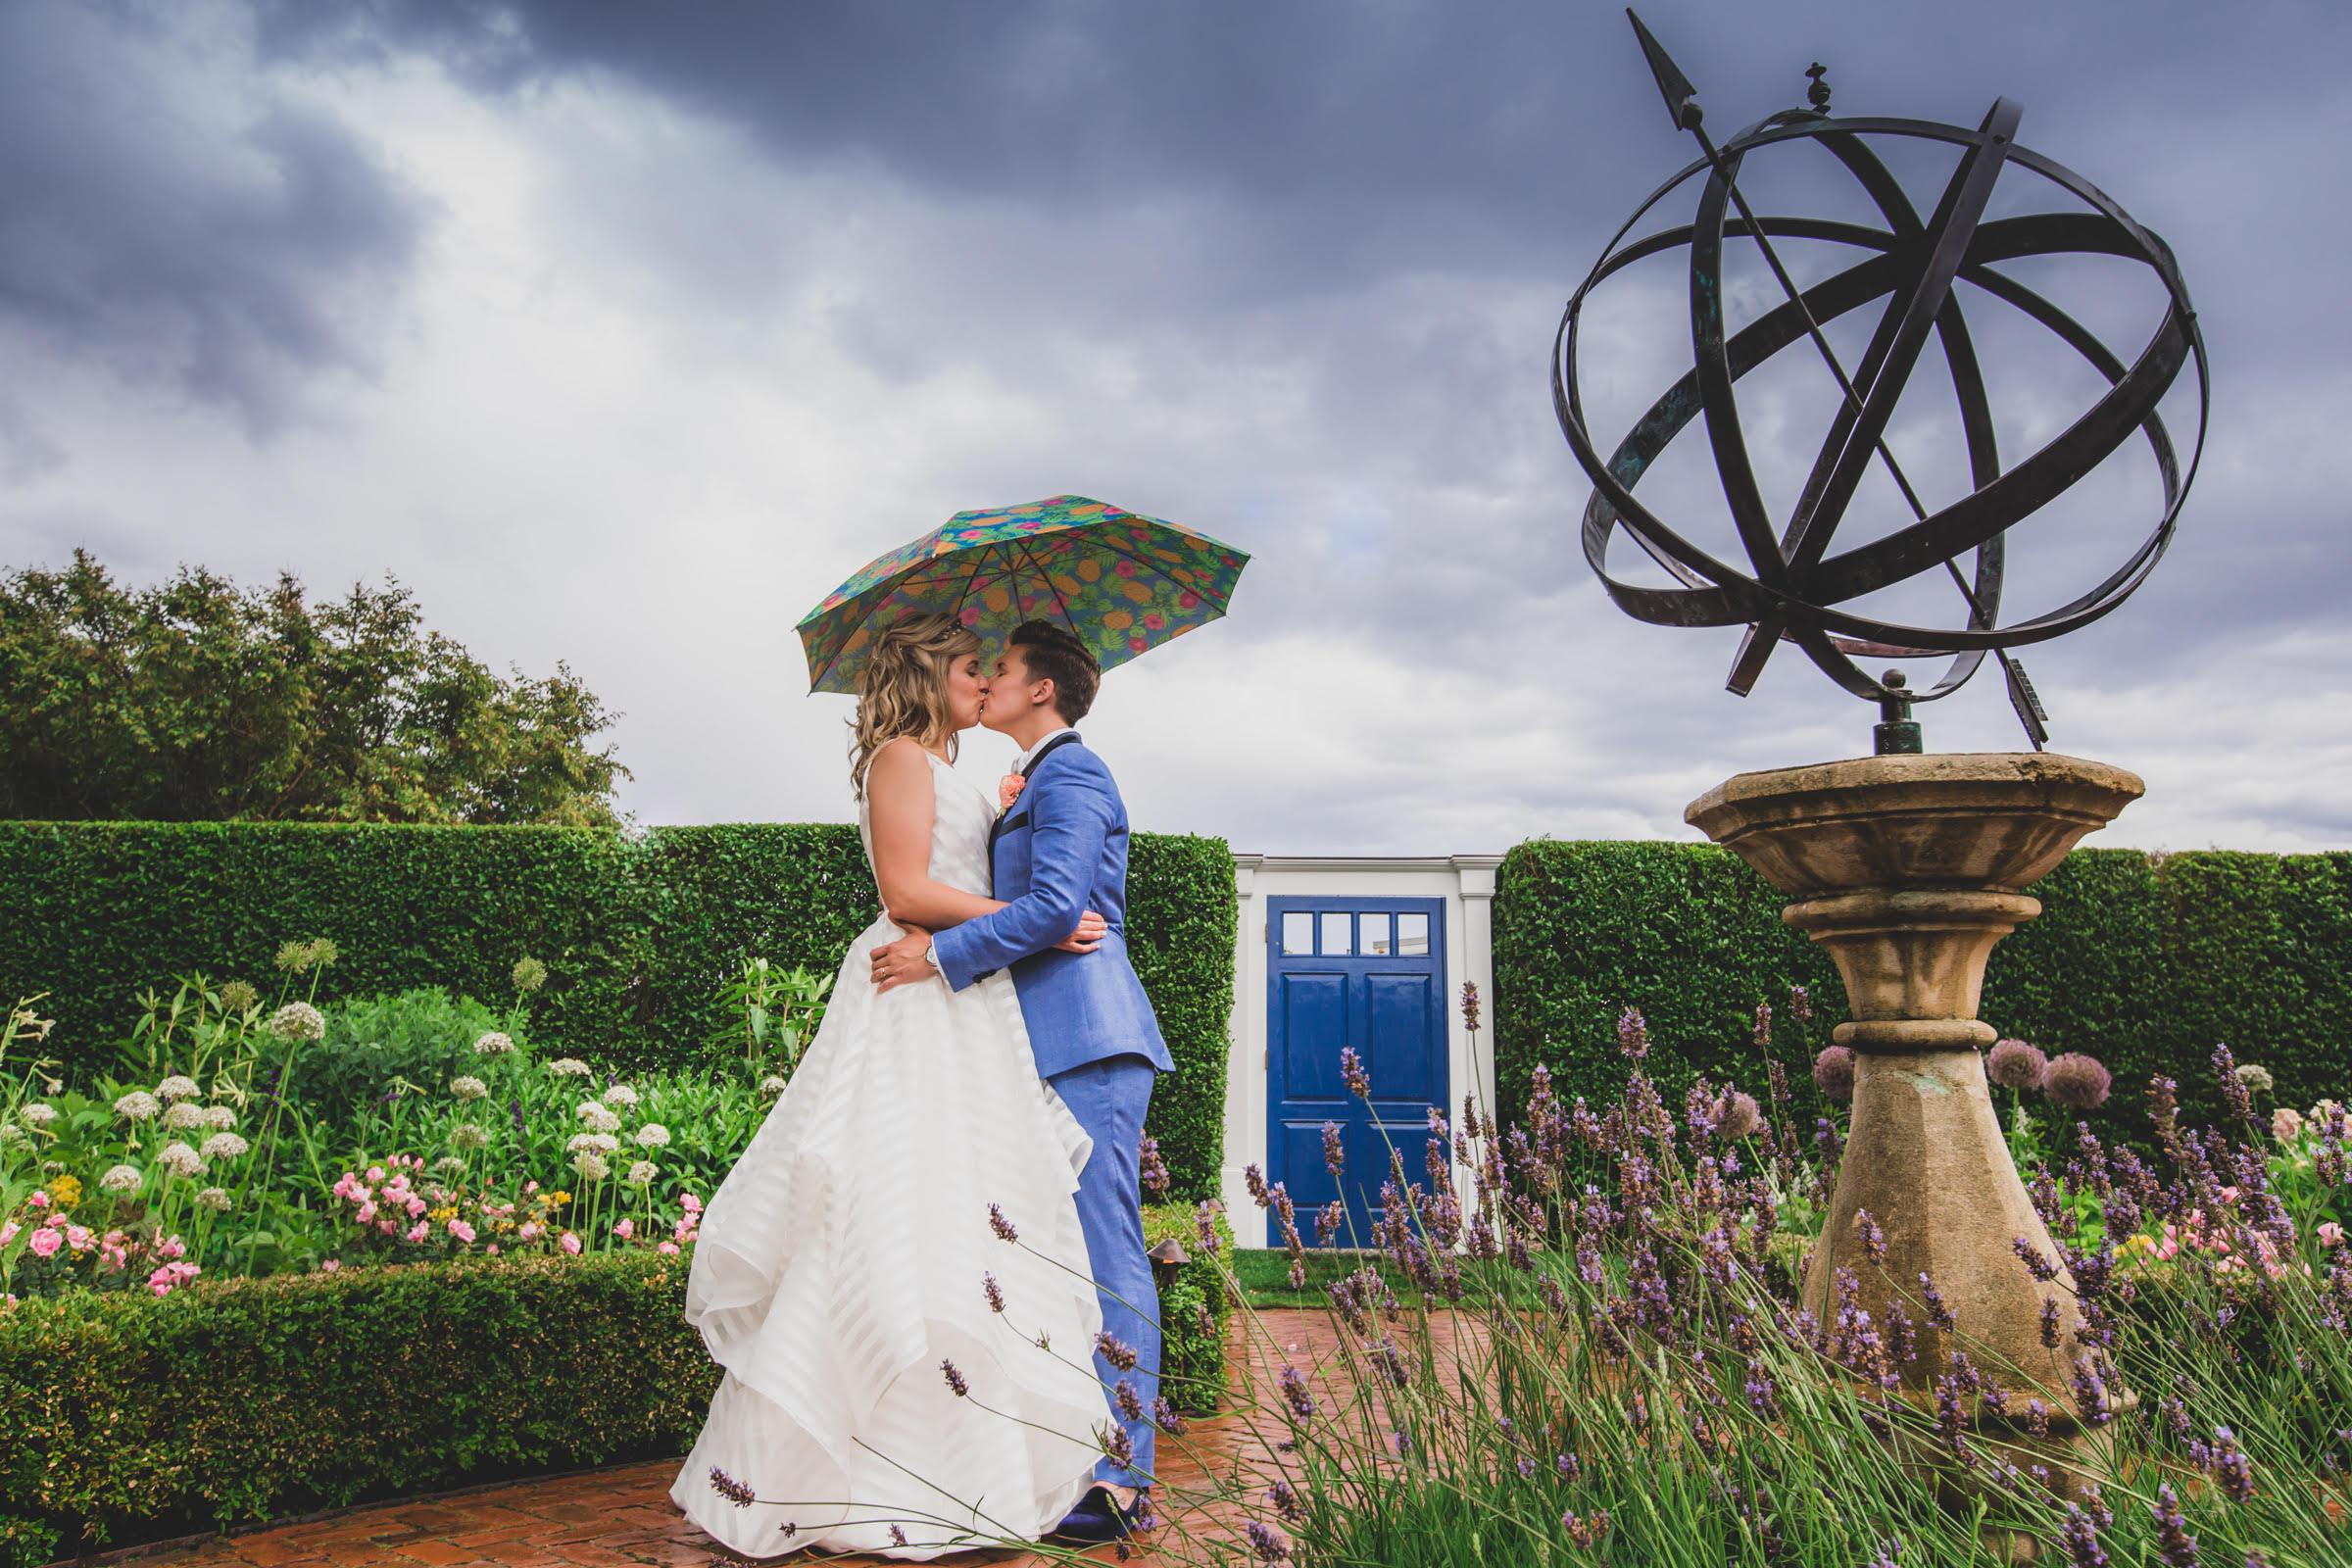 two-brides-under-an-umbrella-rainy-day-wedding.